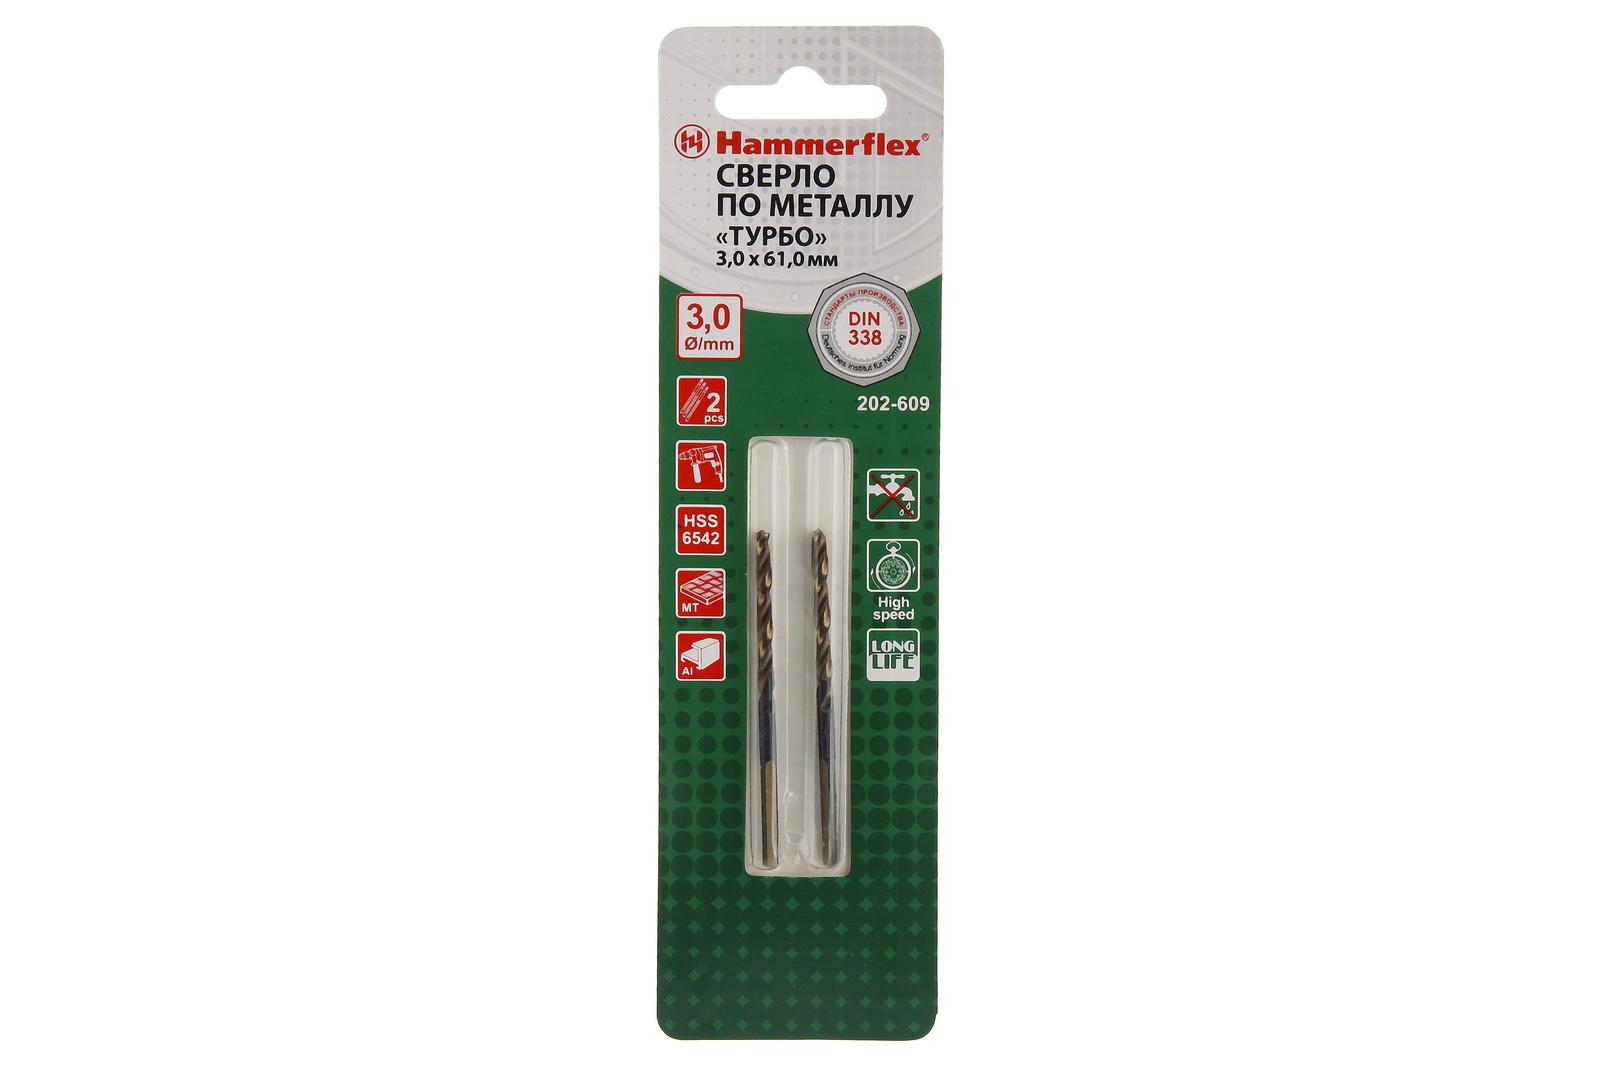 Сверло по металлу Hammer 202-609 dr mt 3,0мм*61мм сверло по металлу hammer 202 161 dr mt 7 0мм 109мм